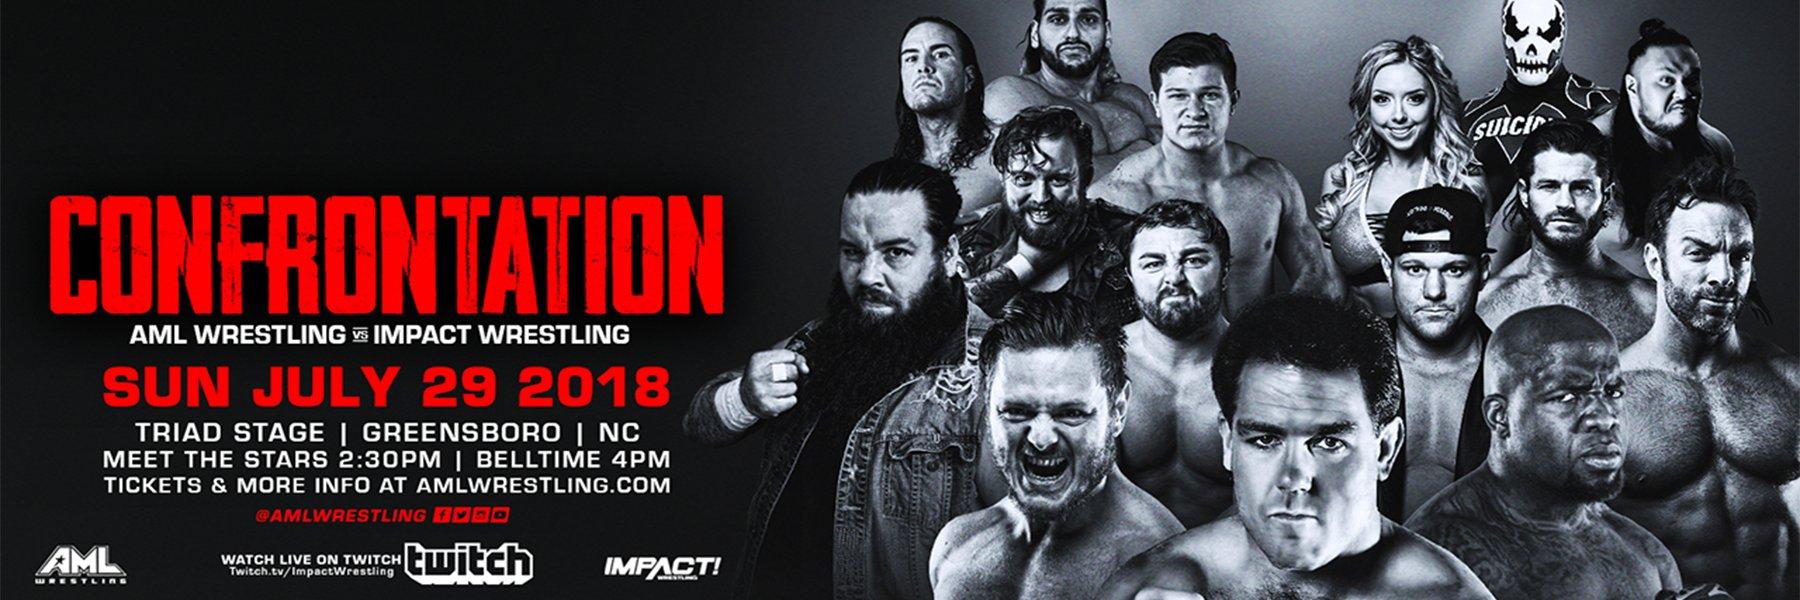 AML vs Impact iPPV: Matt Sydal, Moose, Tessa Blanchard, Eli Drake, Allie